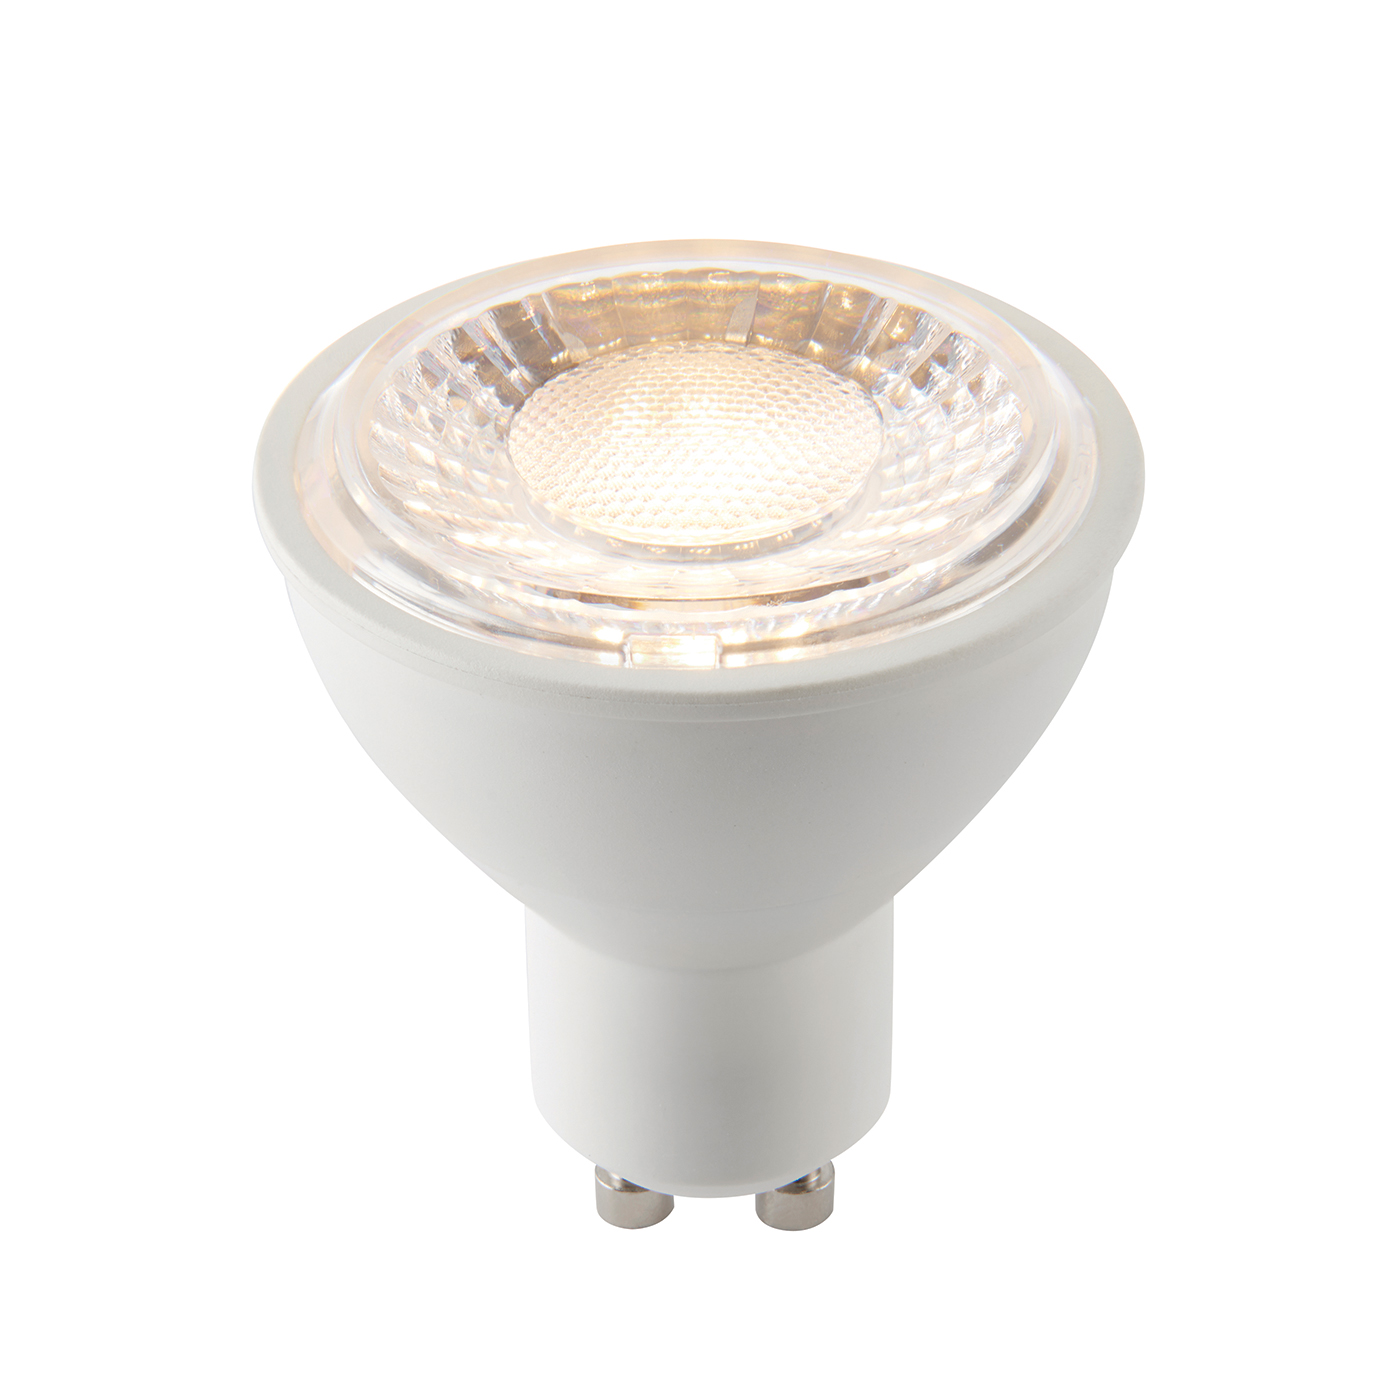 Endon 70051 LED SMD Lamp 3000K GU10 6W